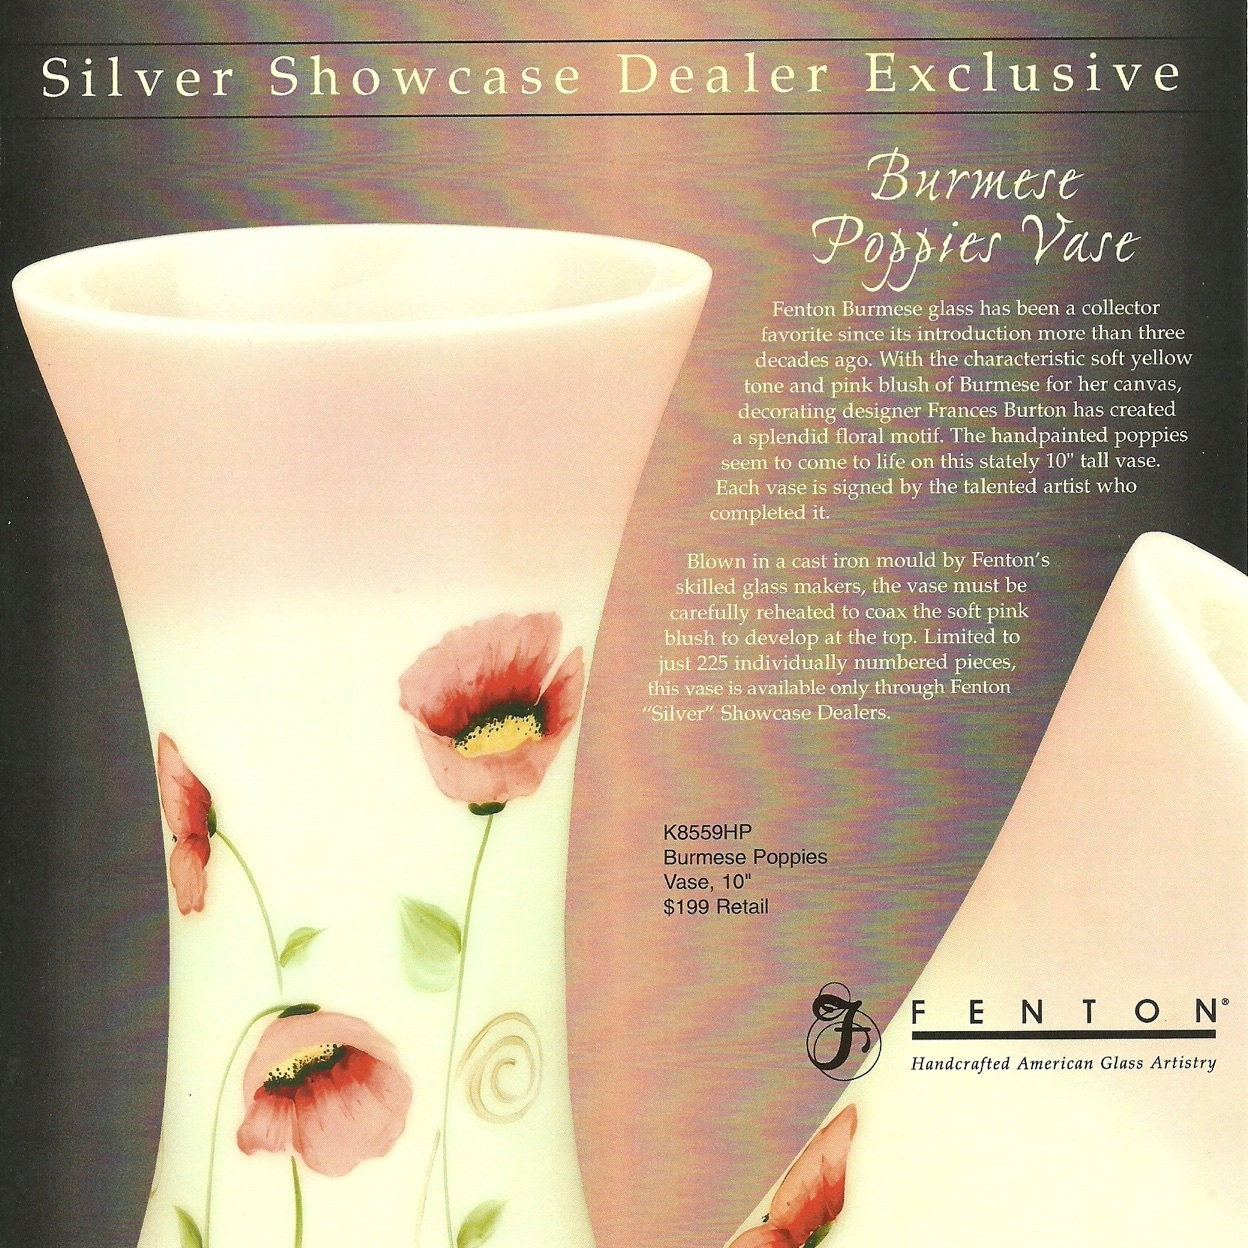 2006 Burmese Poppies Vase